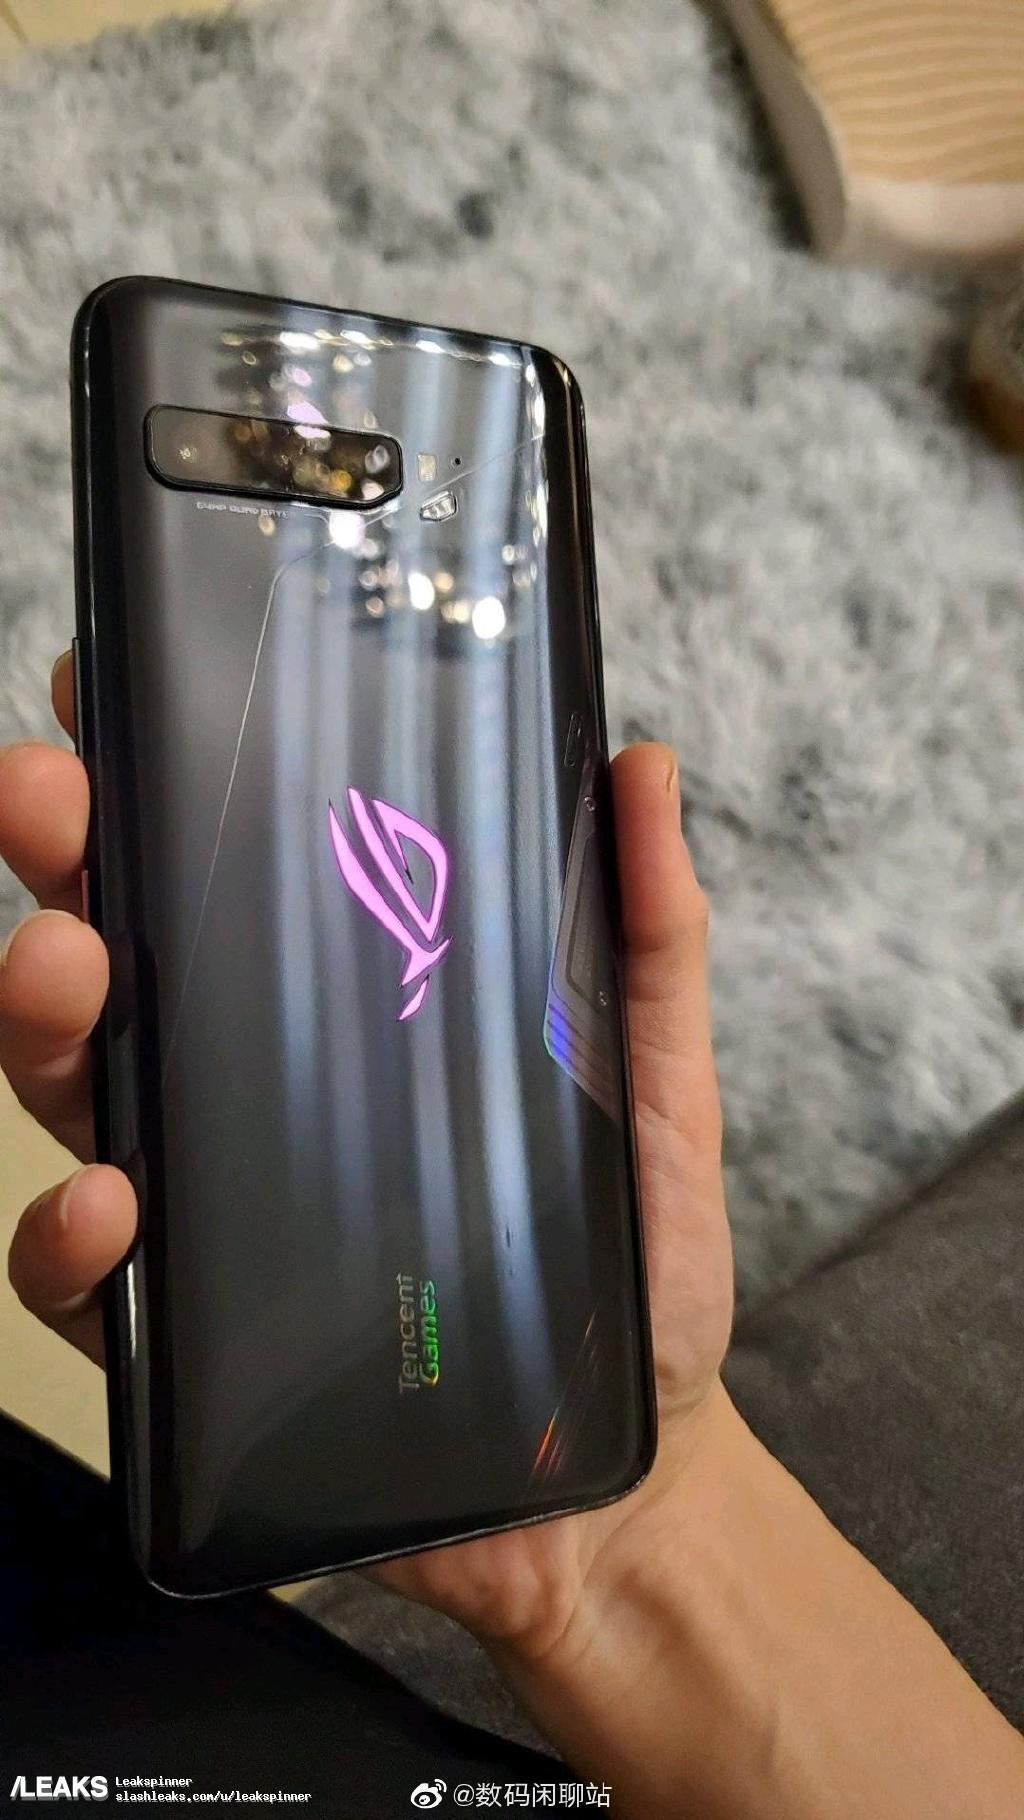 Asus ROG Phone 3 announced